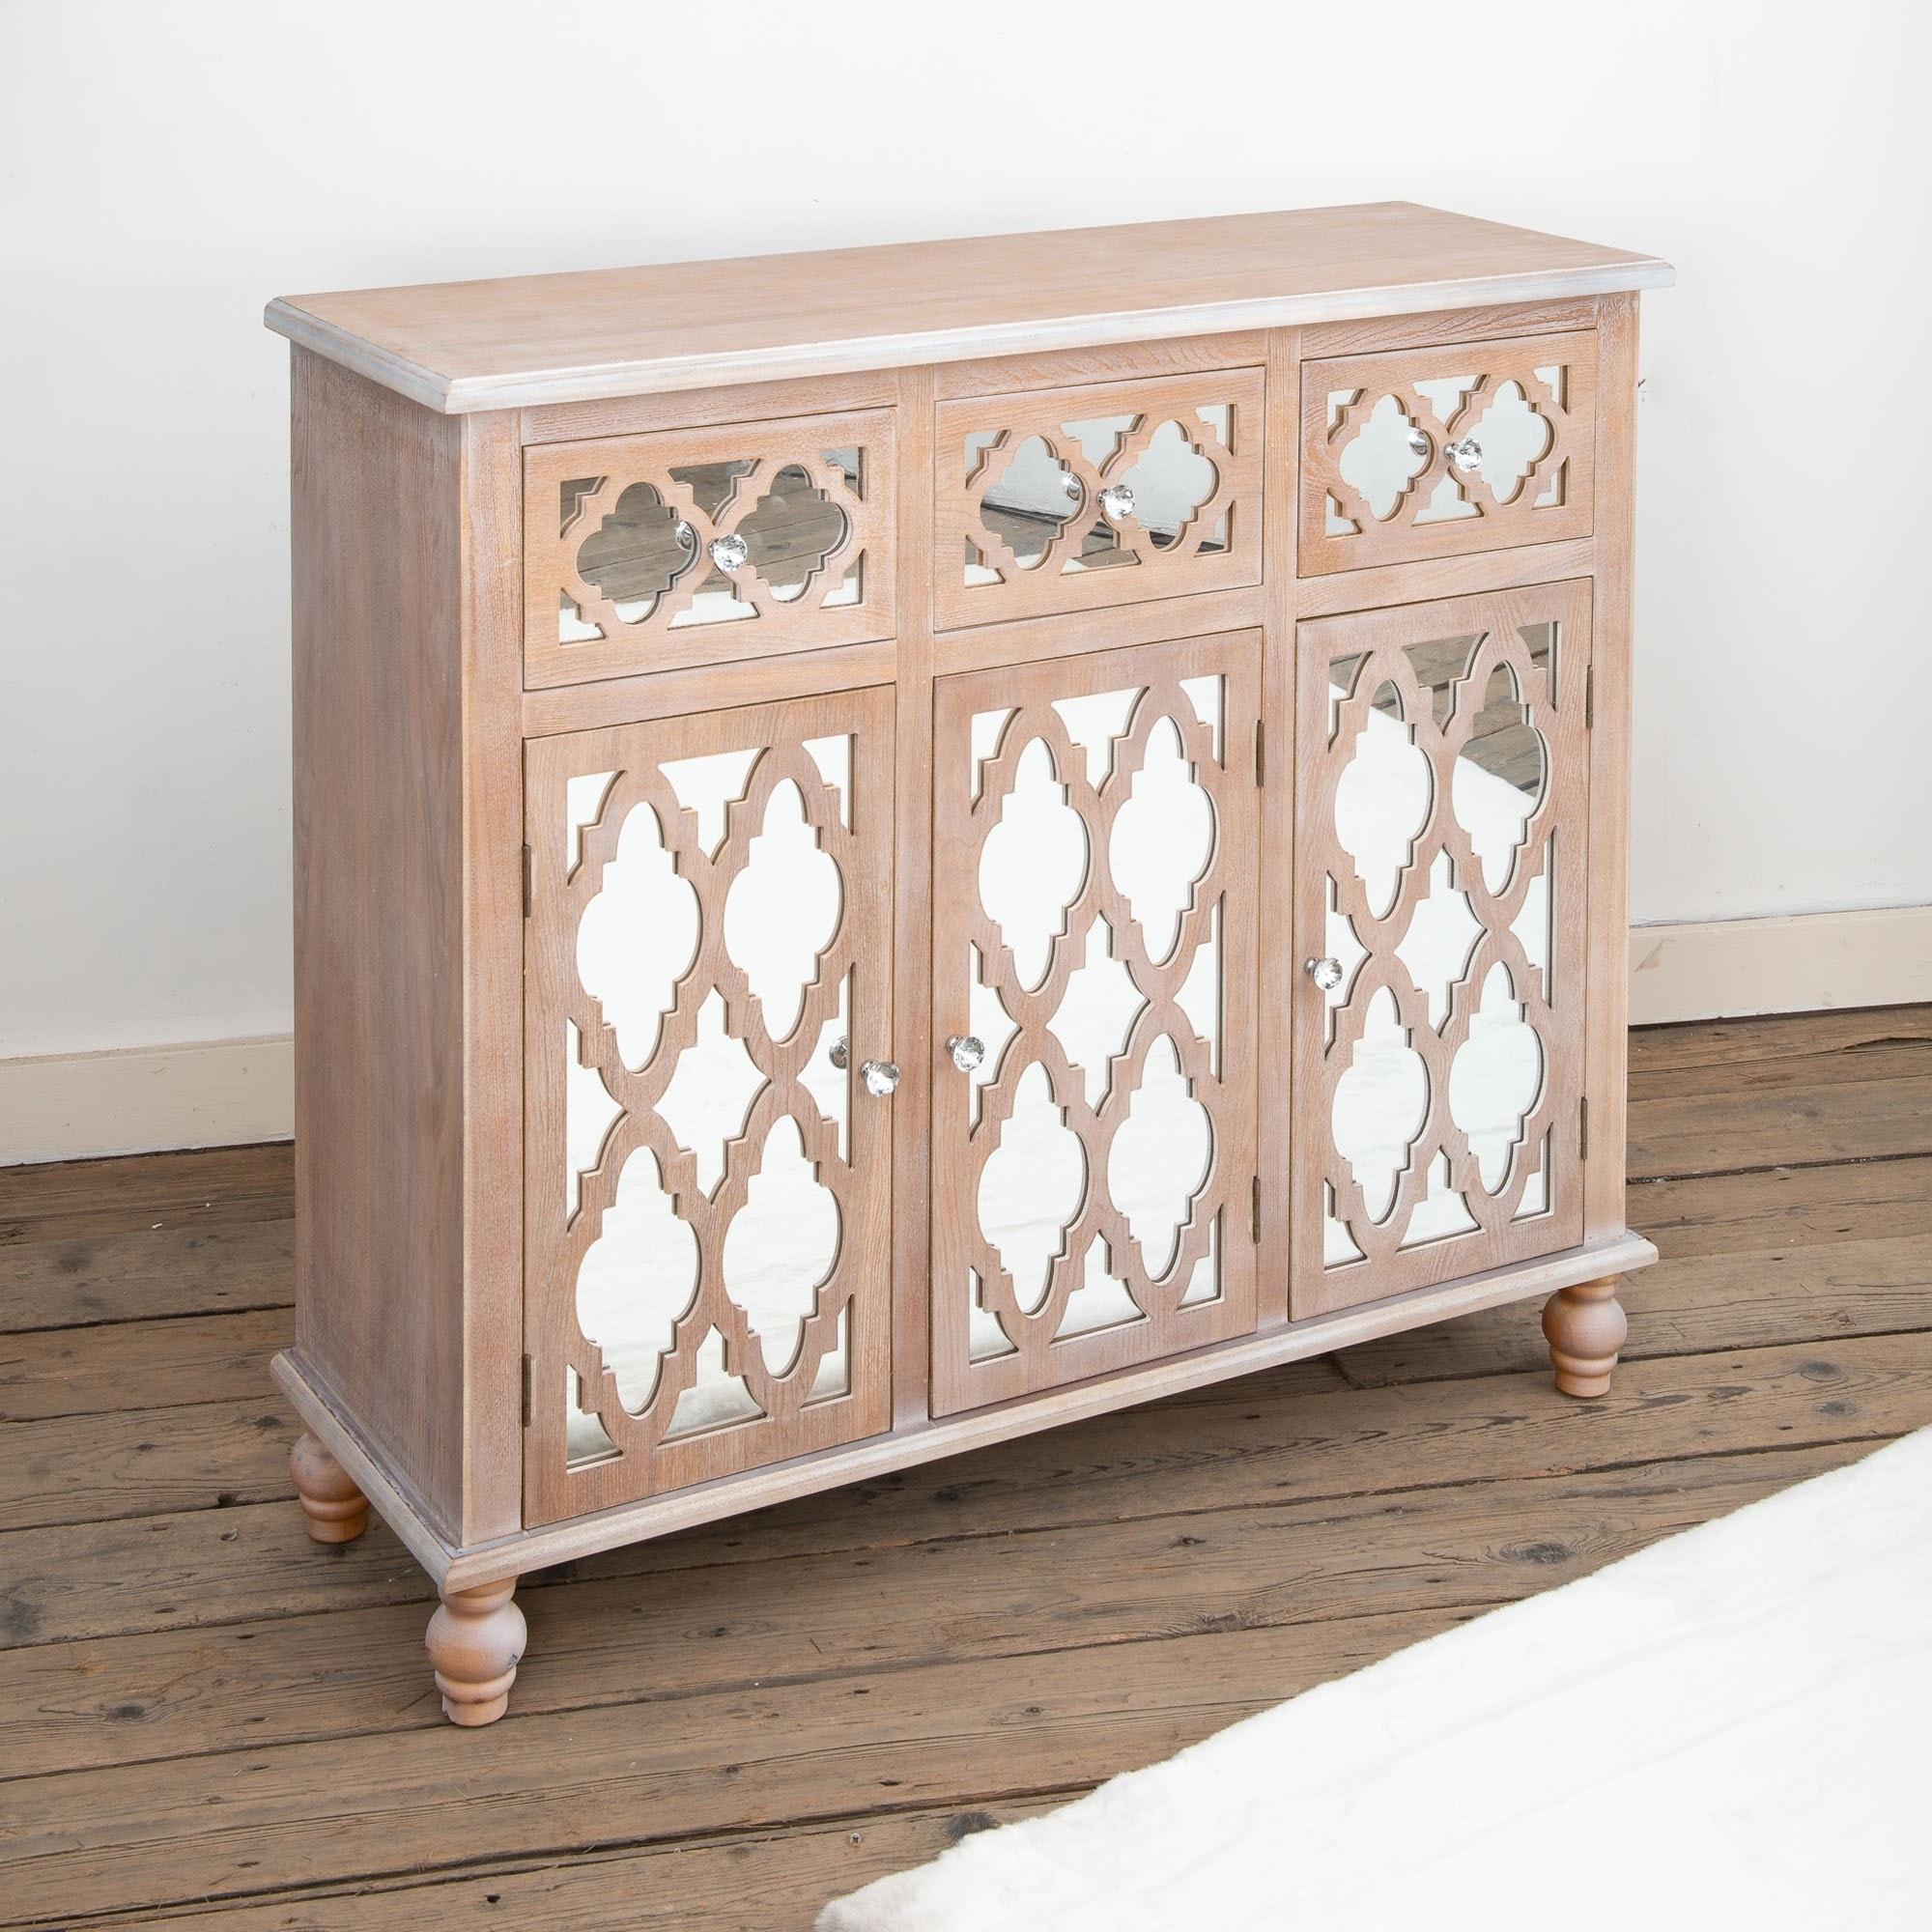 Wood Lattice Mirrored Sideboard Cabinet Wooden Sideboard